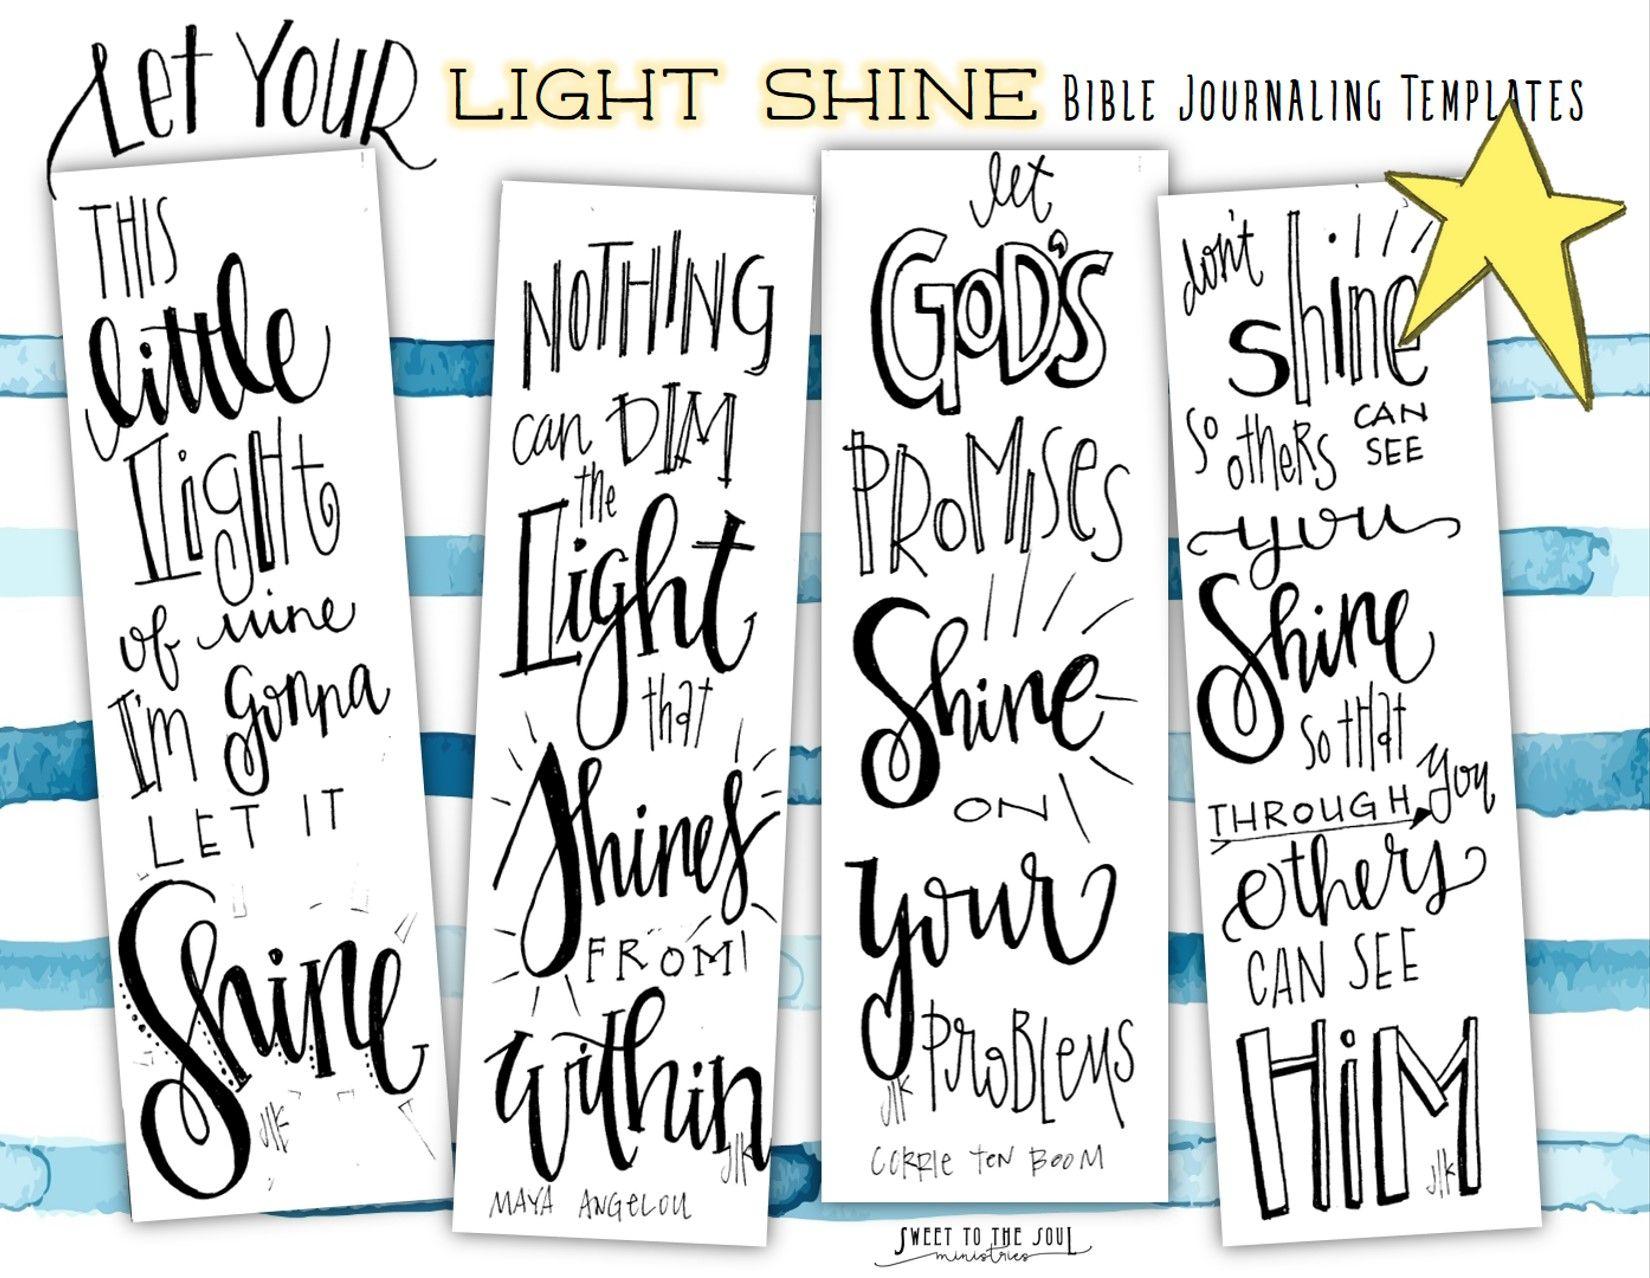 Free Bible Journaling Templates Let Your Light Shine